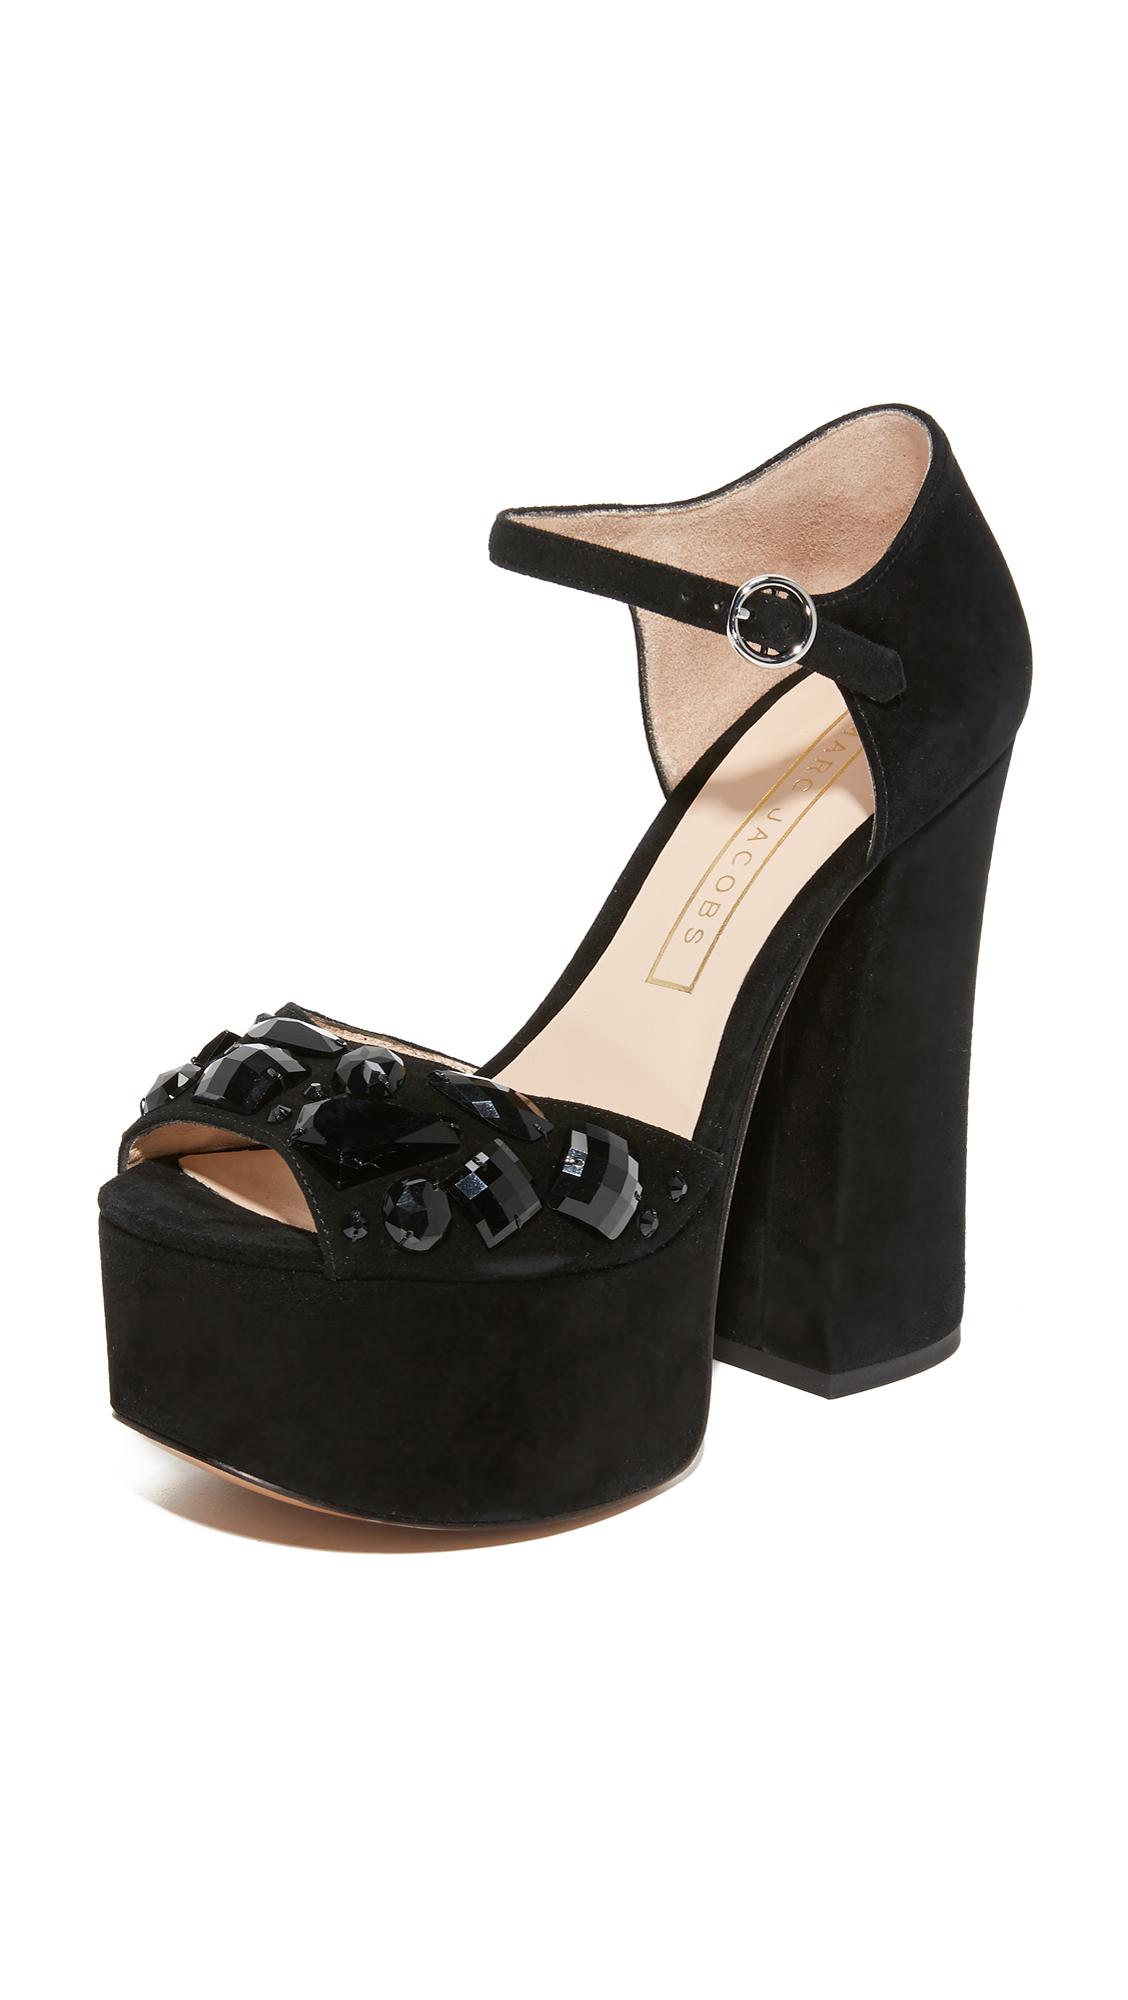 marc jacobs female marc jacobs adriana platform sandals black